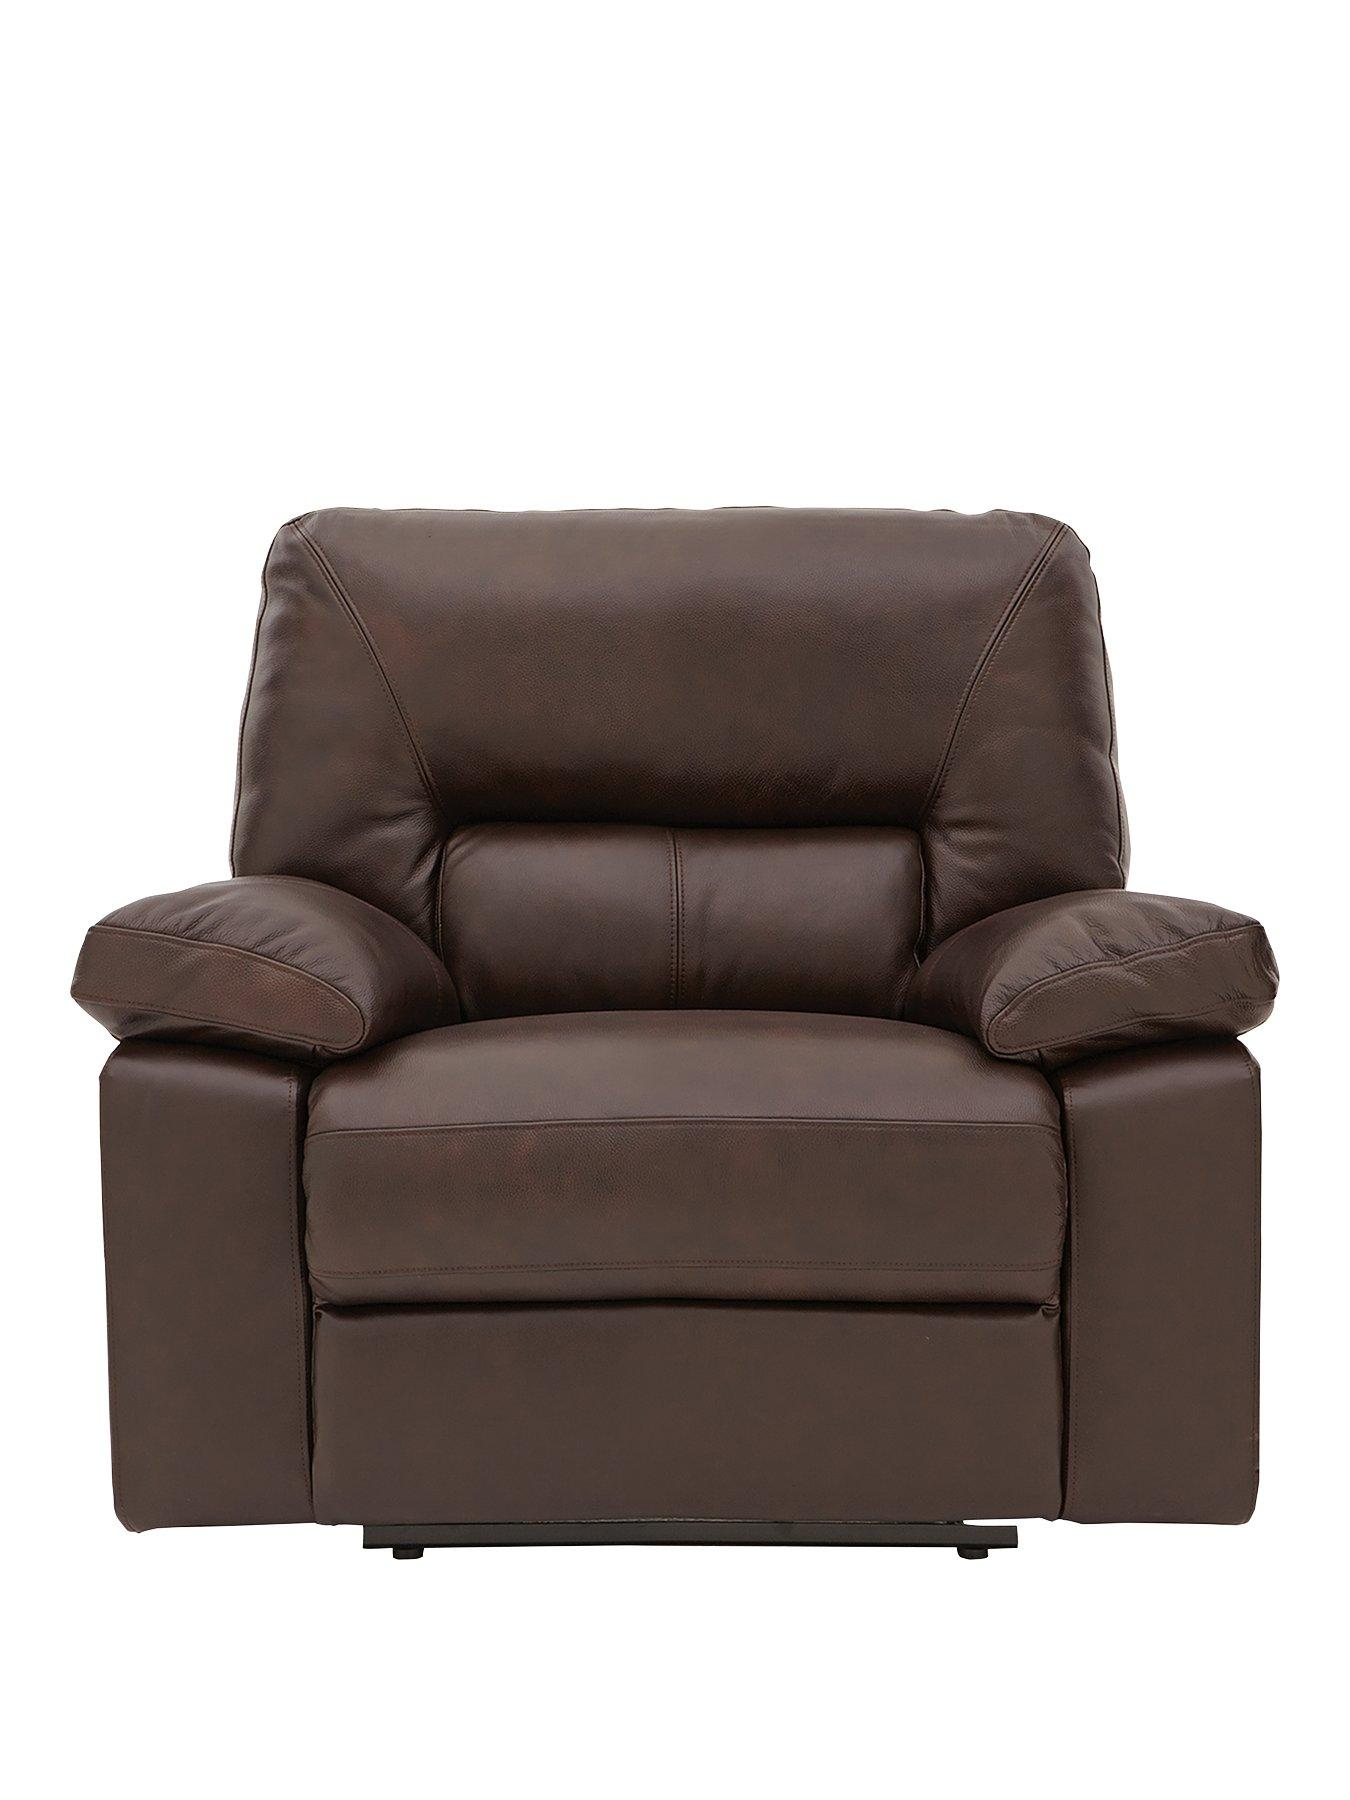 power recliner chairs uk orange arm chair newberg premium leather armchair very co